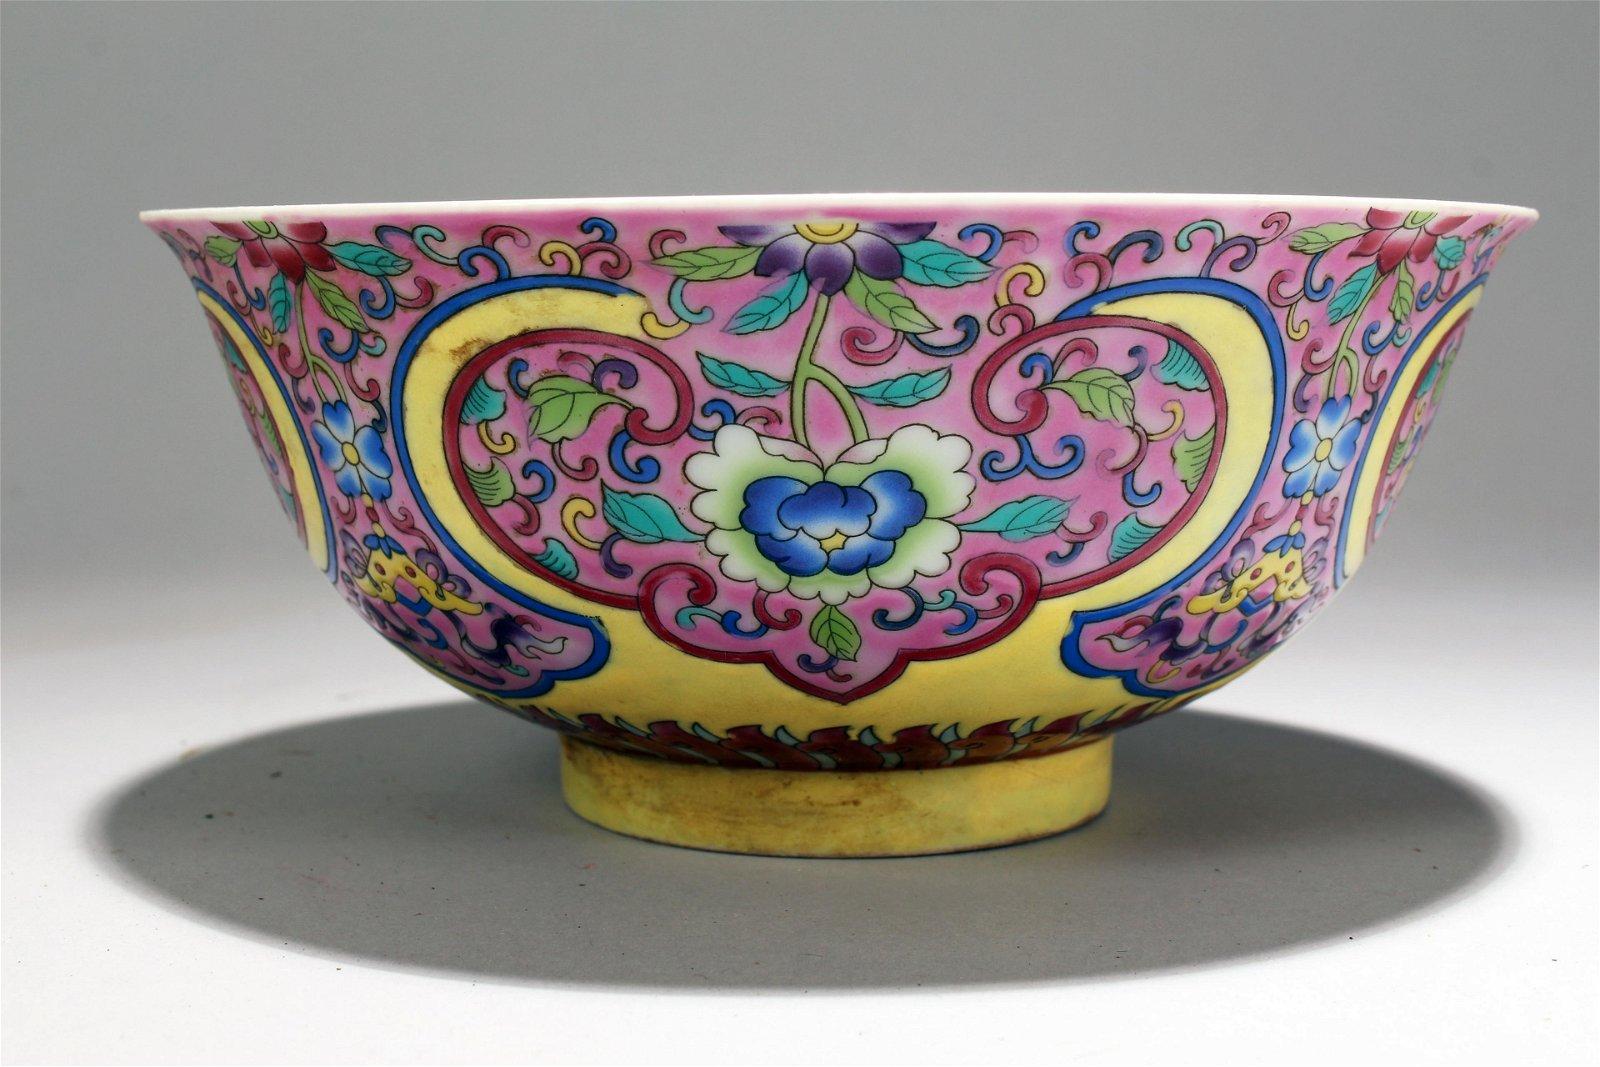 A Chinese Bat-framing Pink-fortune Estate Porcelain